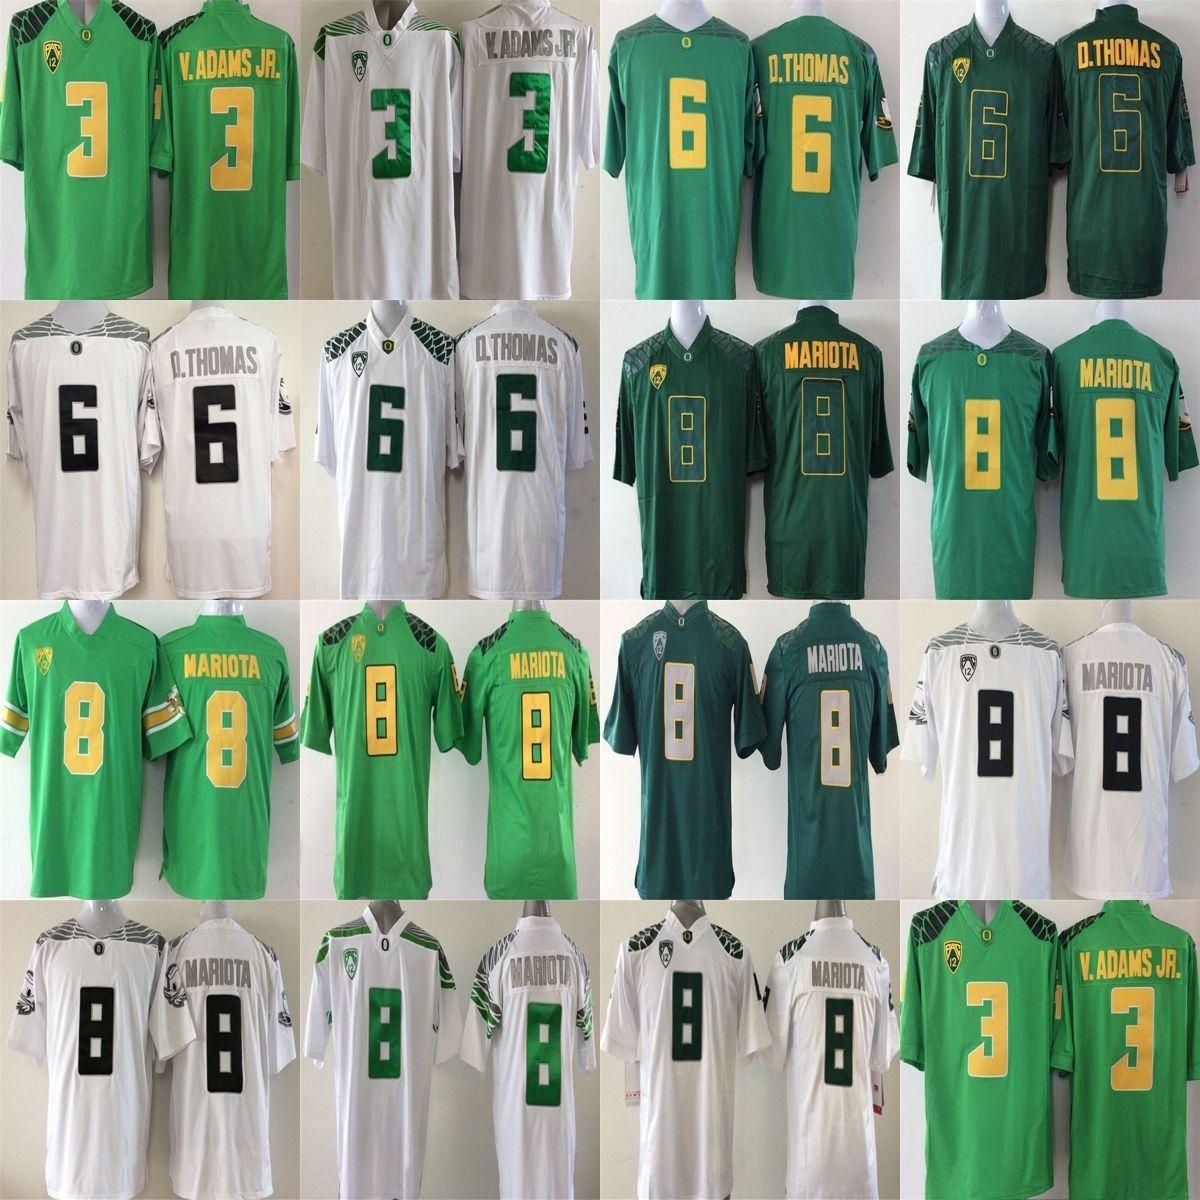 2017 Cheap Wholesale Mens Oregon Ducks 3 Vernon Adam Jr. 6 D.Thomas 8 Marcus  Mariota White Green College Stitched Football Jerseys UK 2019 From  Fanatics 223307bf6